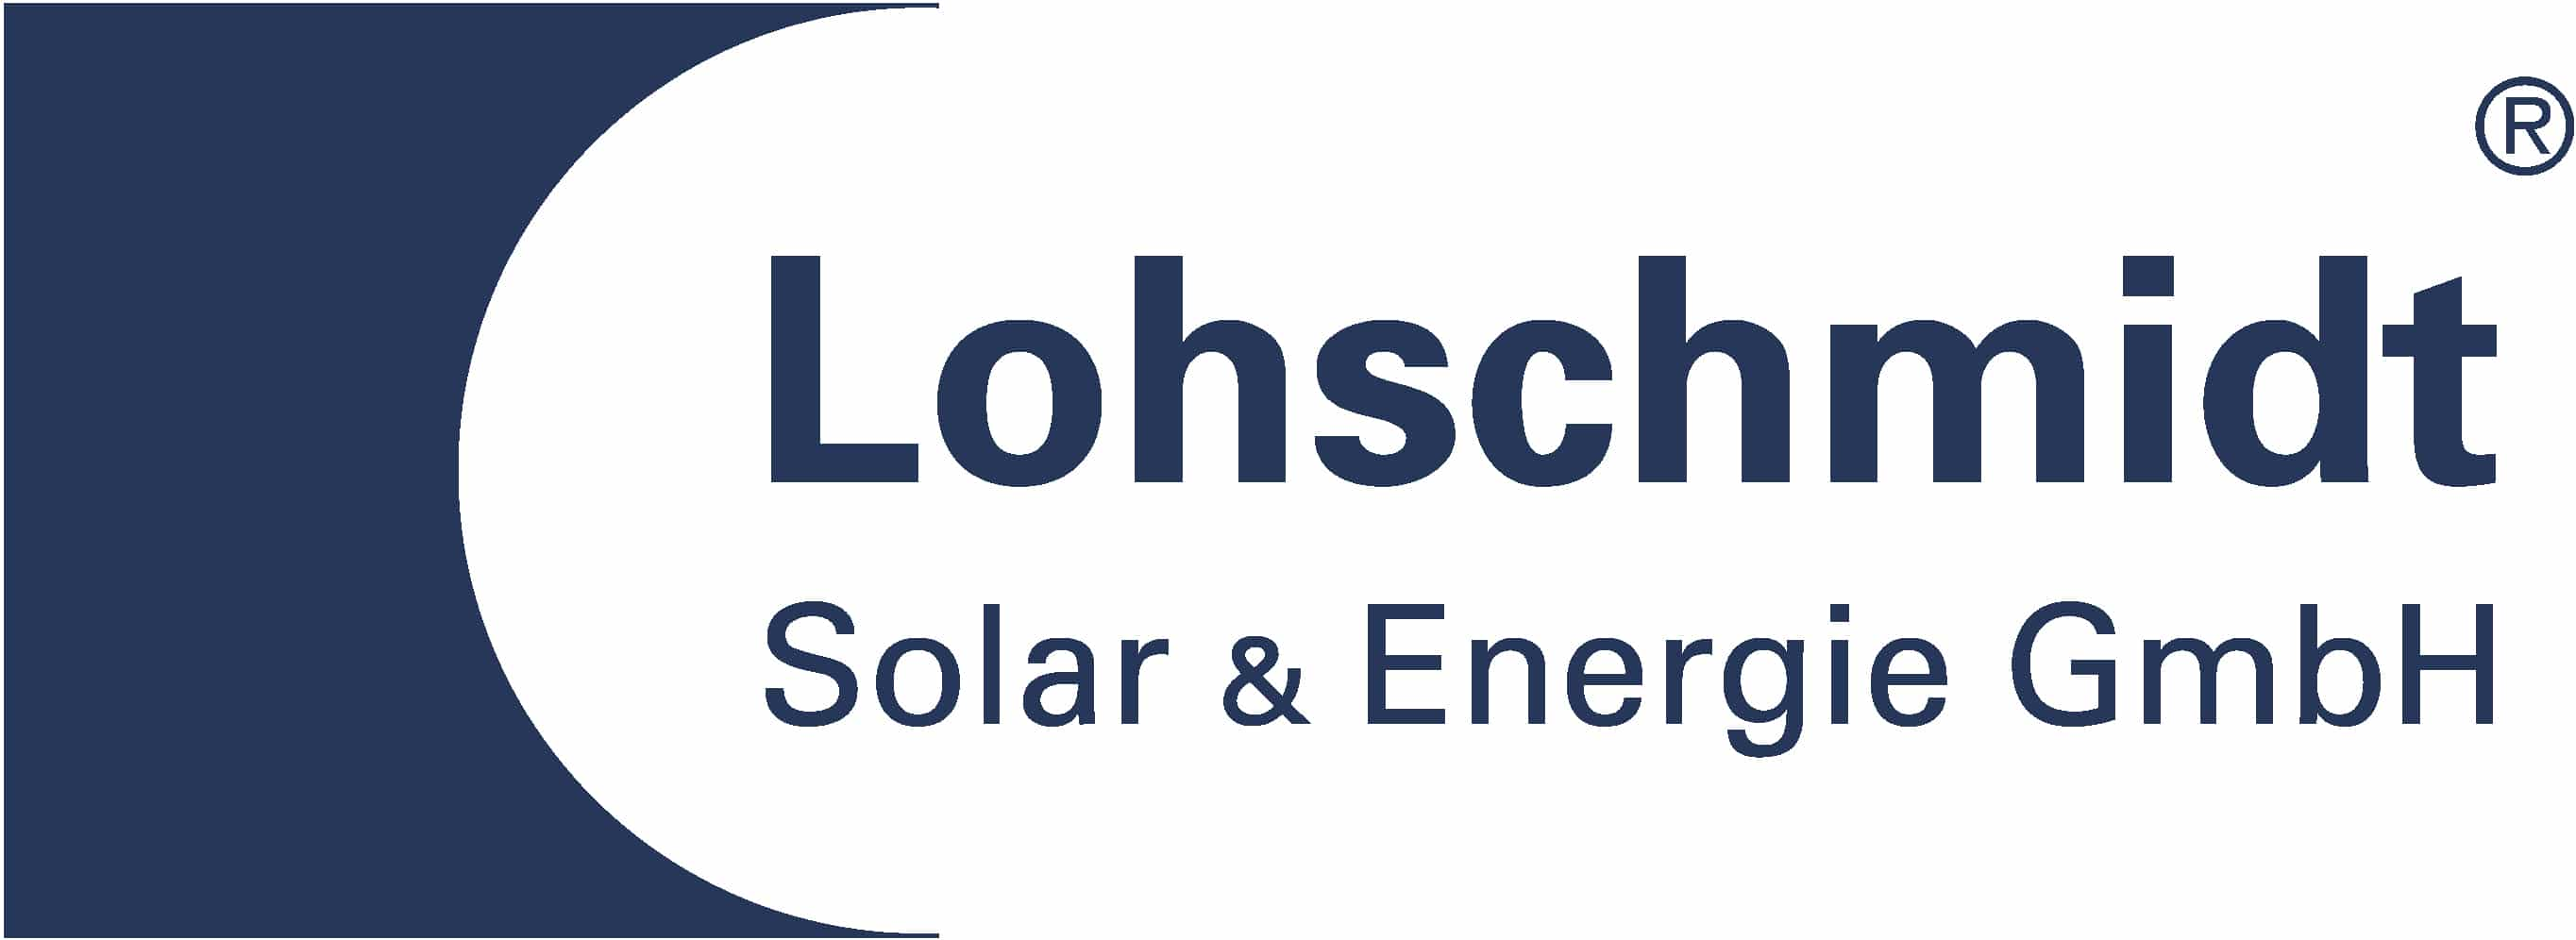 Lohschmidt Solar & Energie GmbH